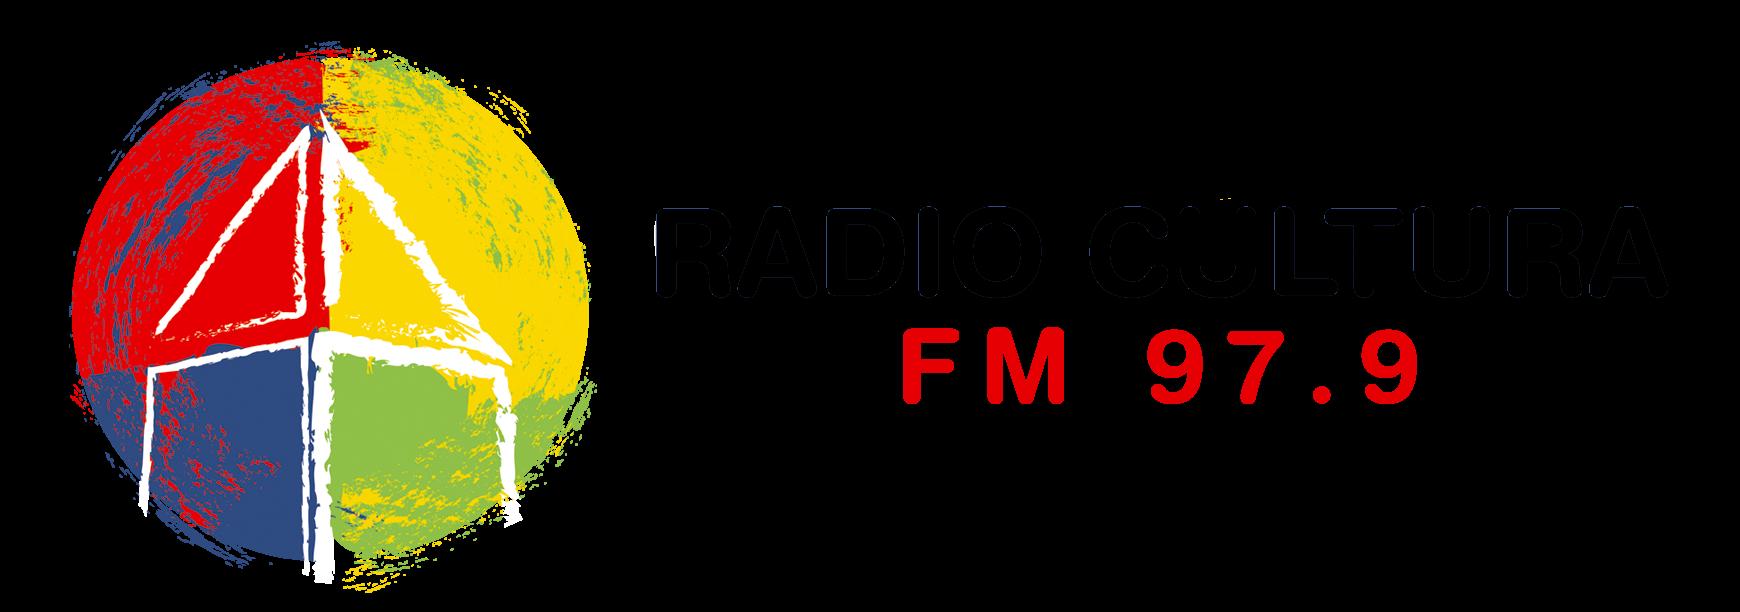 Radio Cultura FM 97.9 Mhz